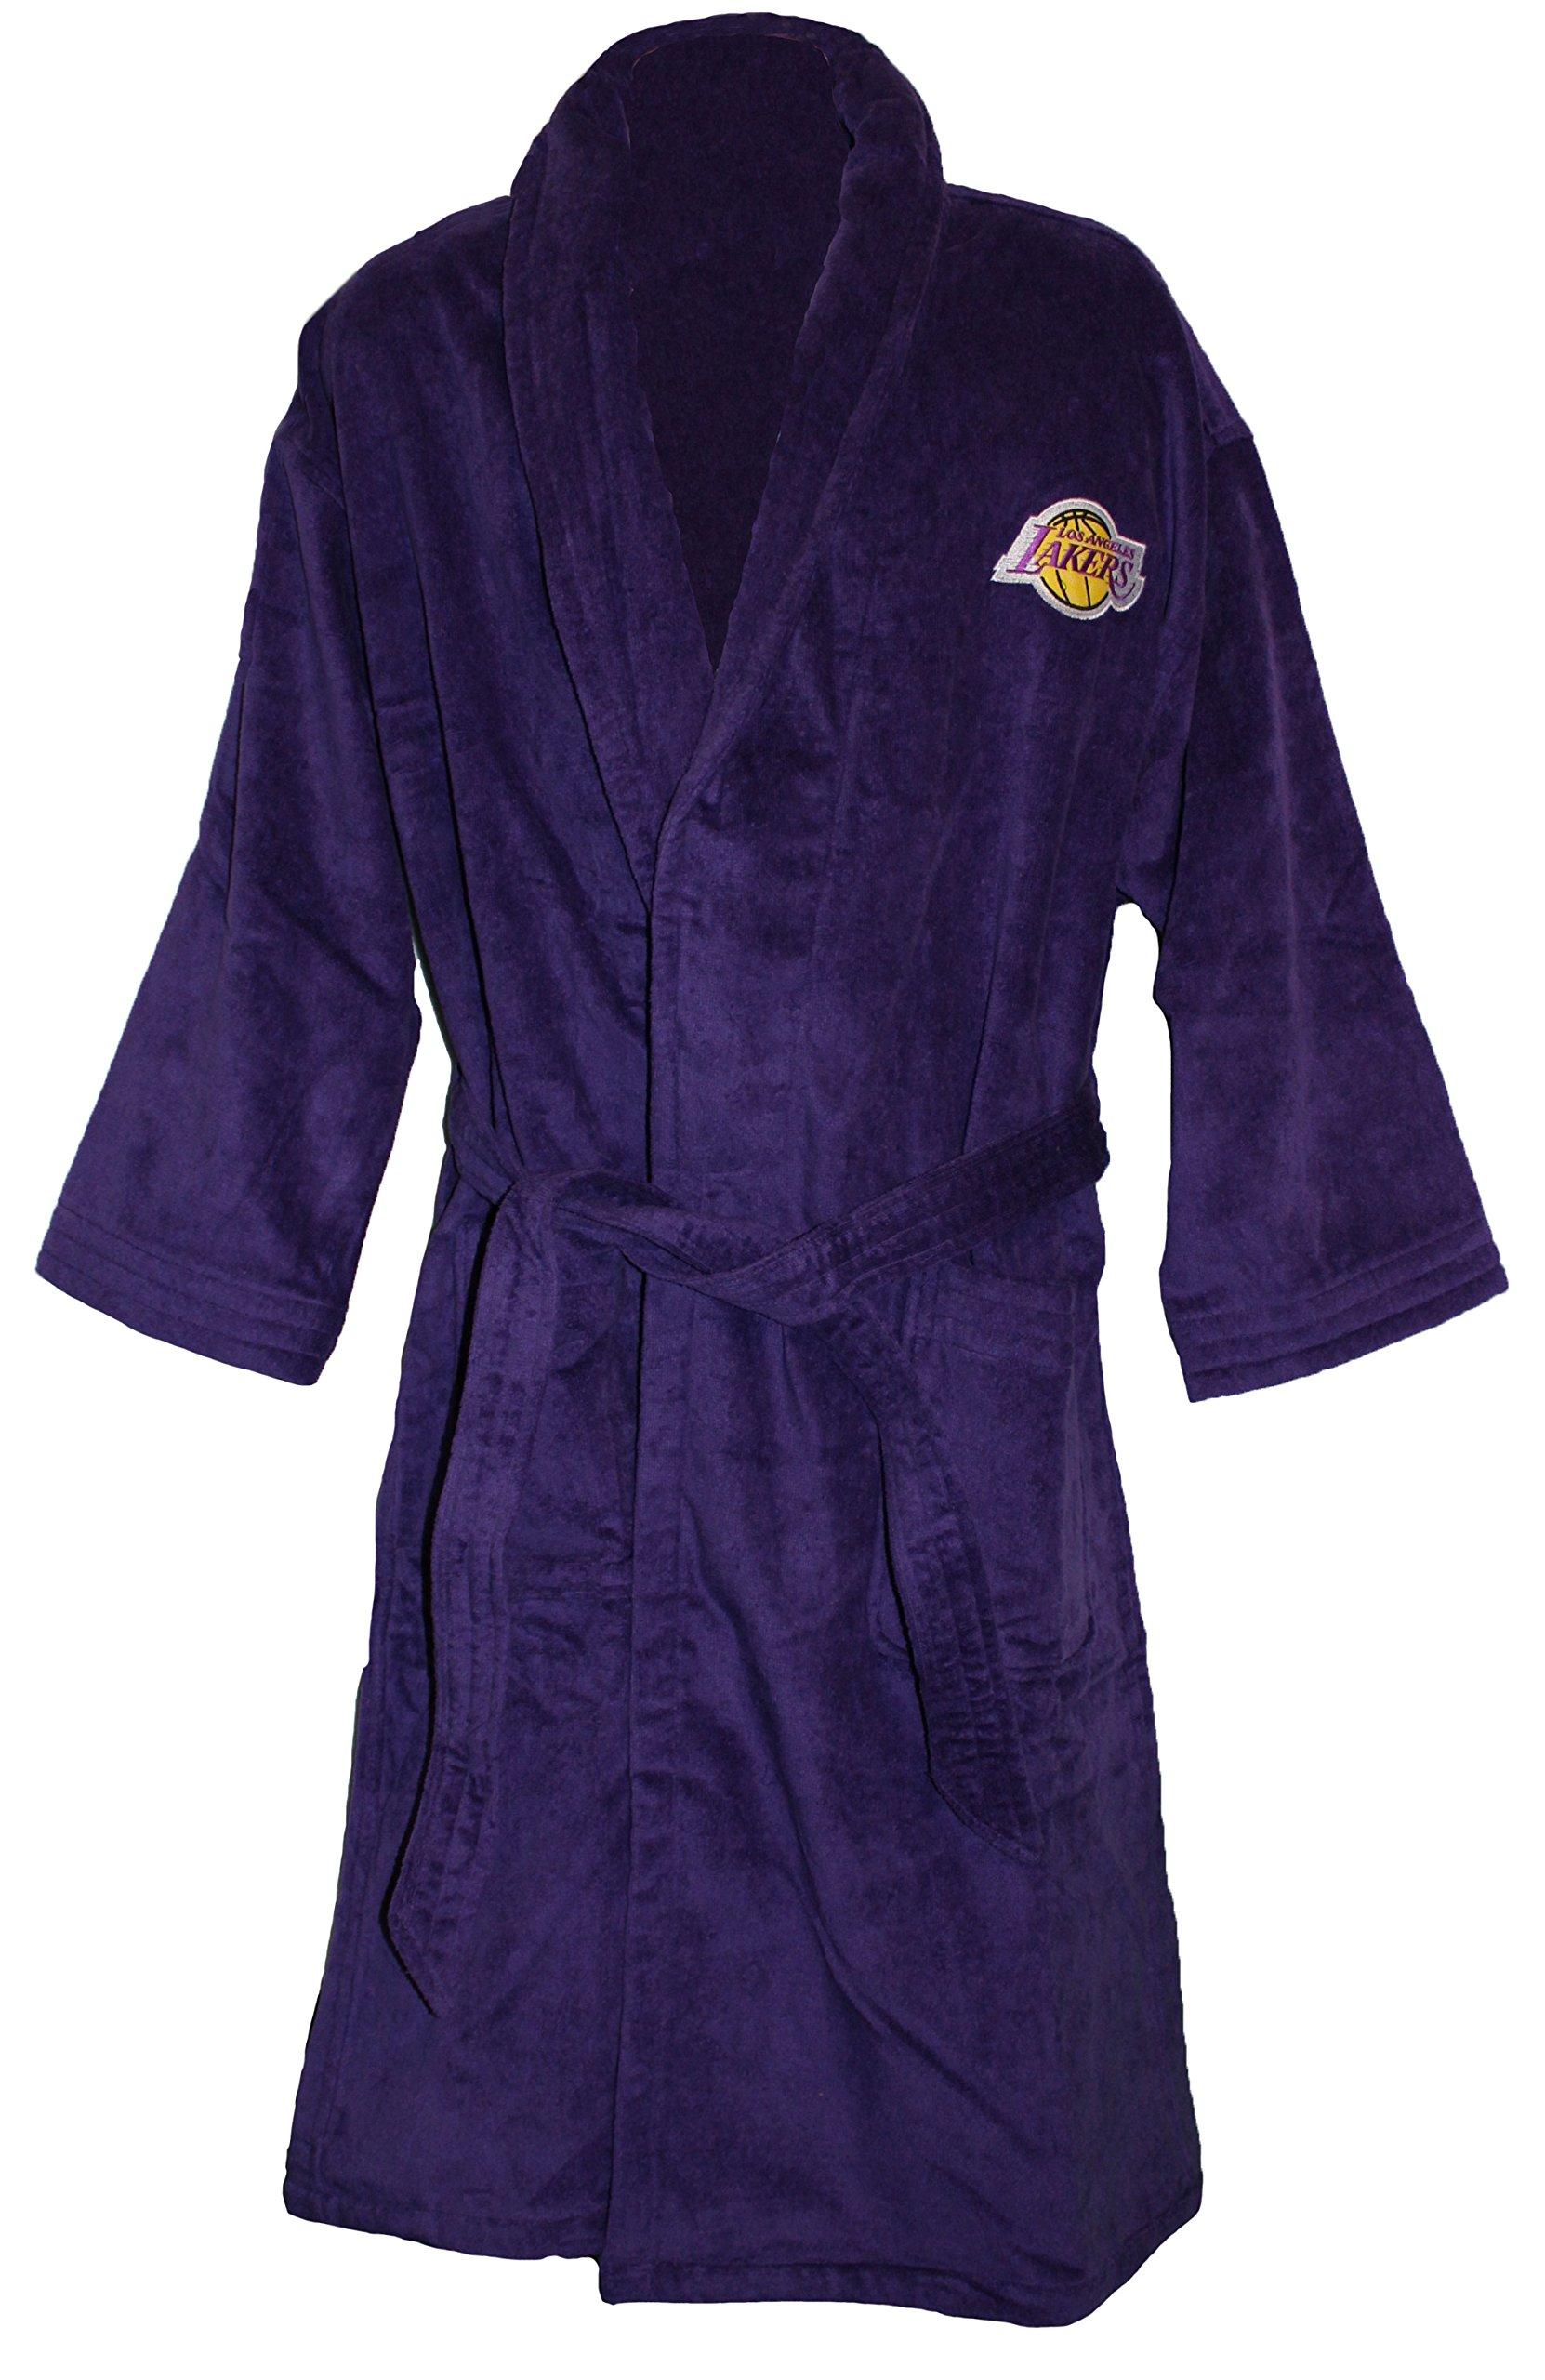 NBA Los Angeles Lakers Luxury Bath Robe, Purple, 100% Cotton by McArthur